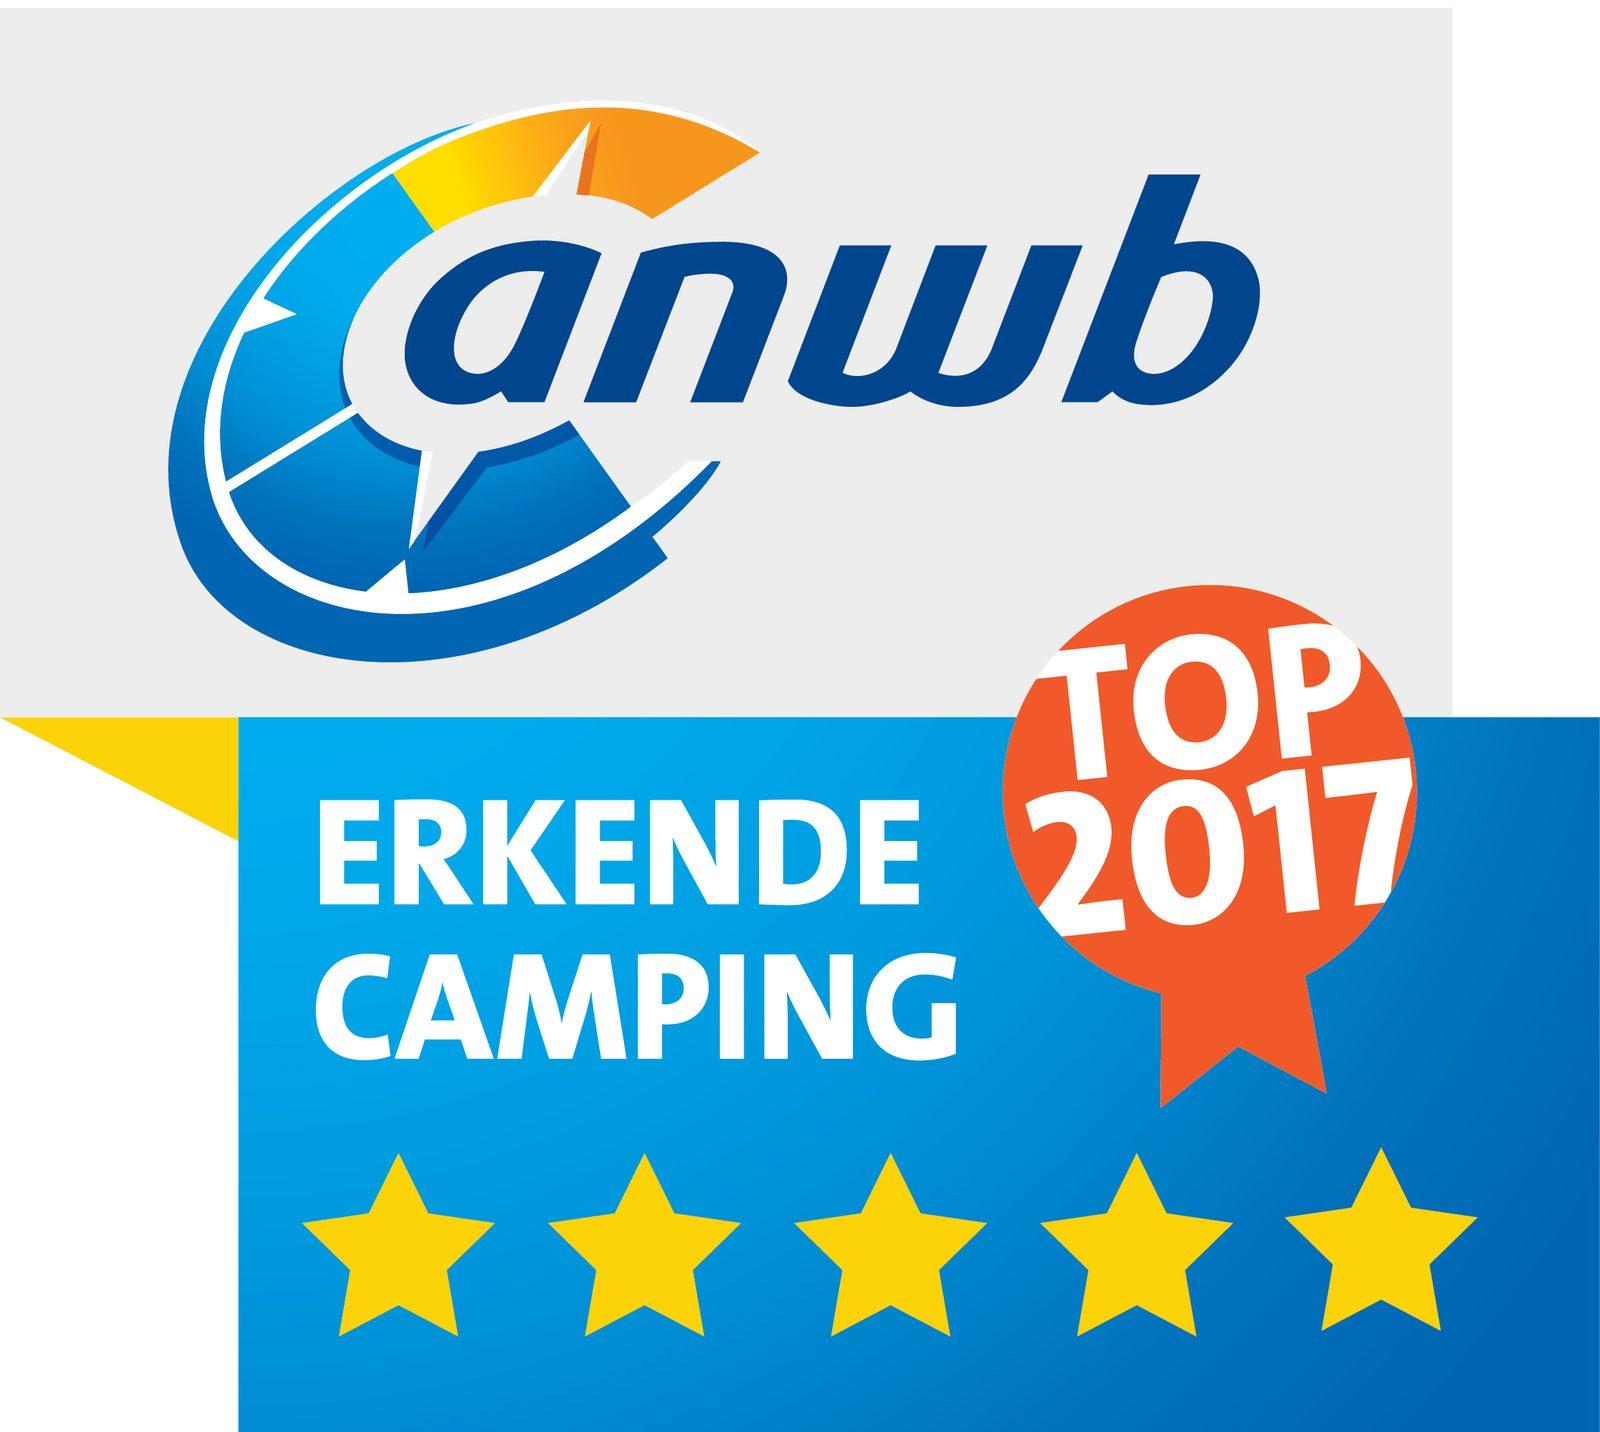 Recreation Park De Boshoek is a 5* TOP Camping once again in 2017!